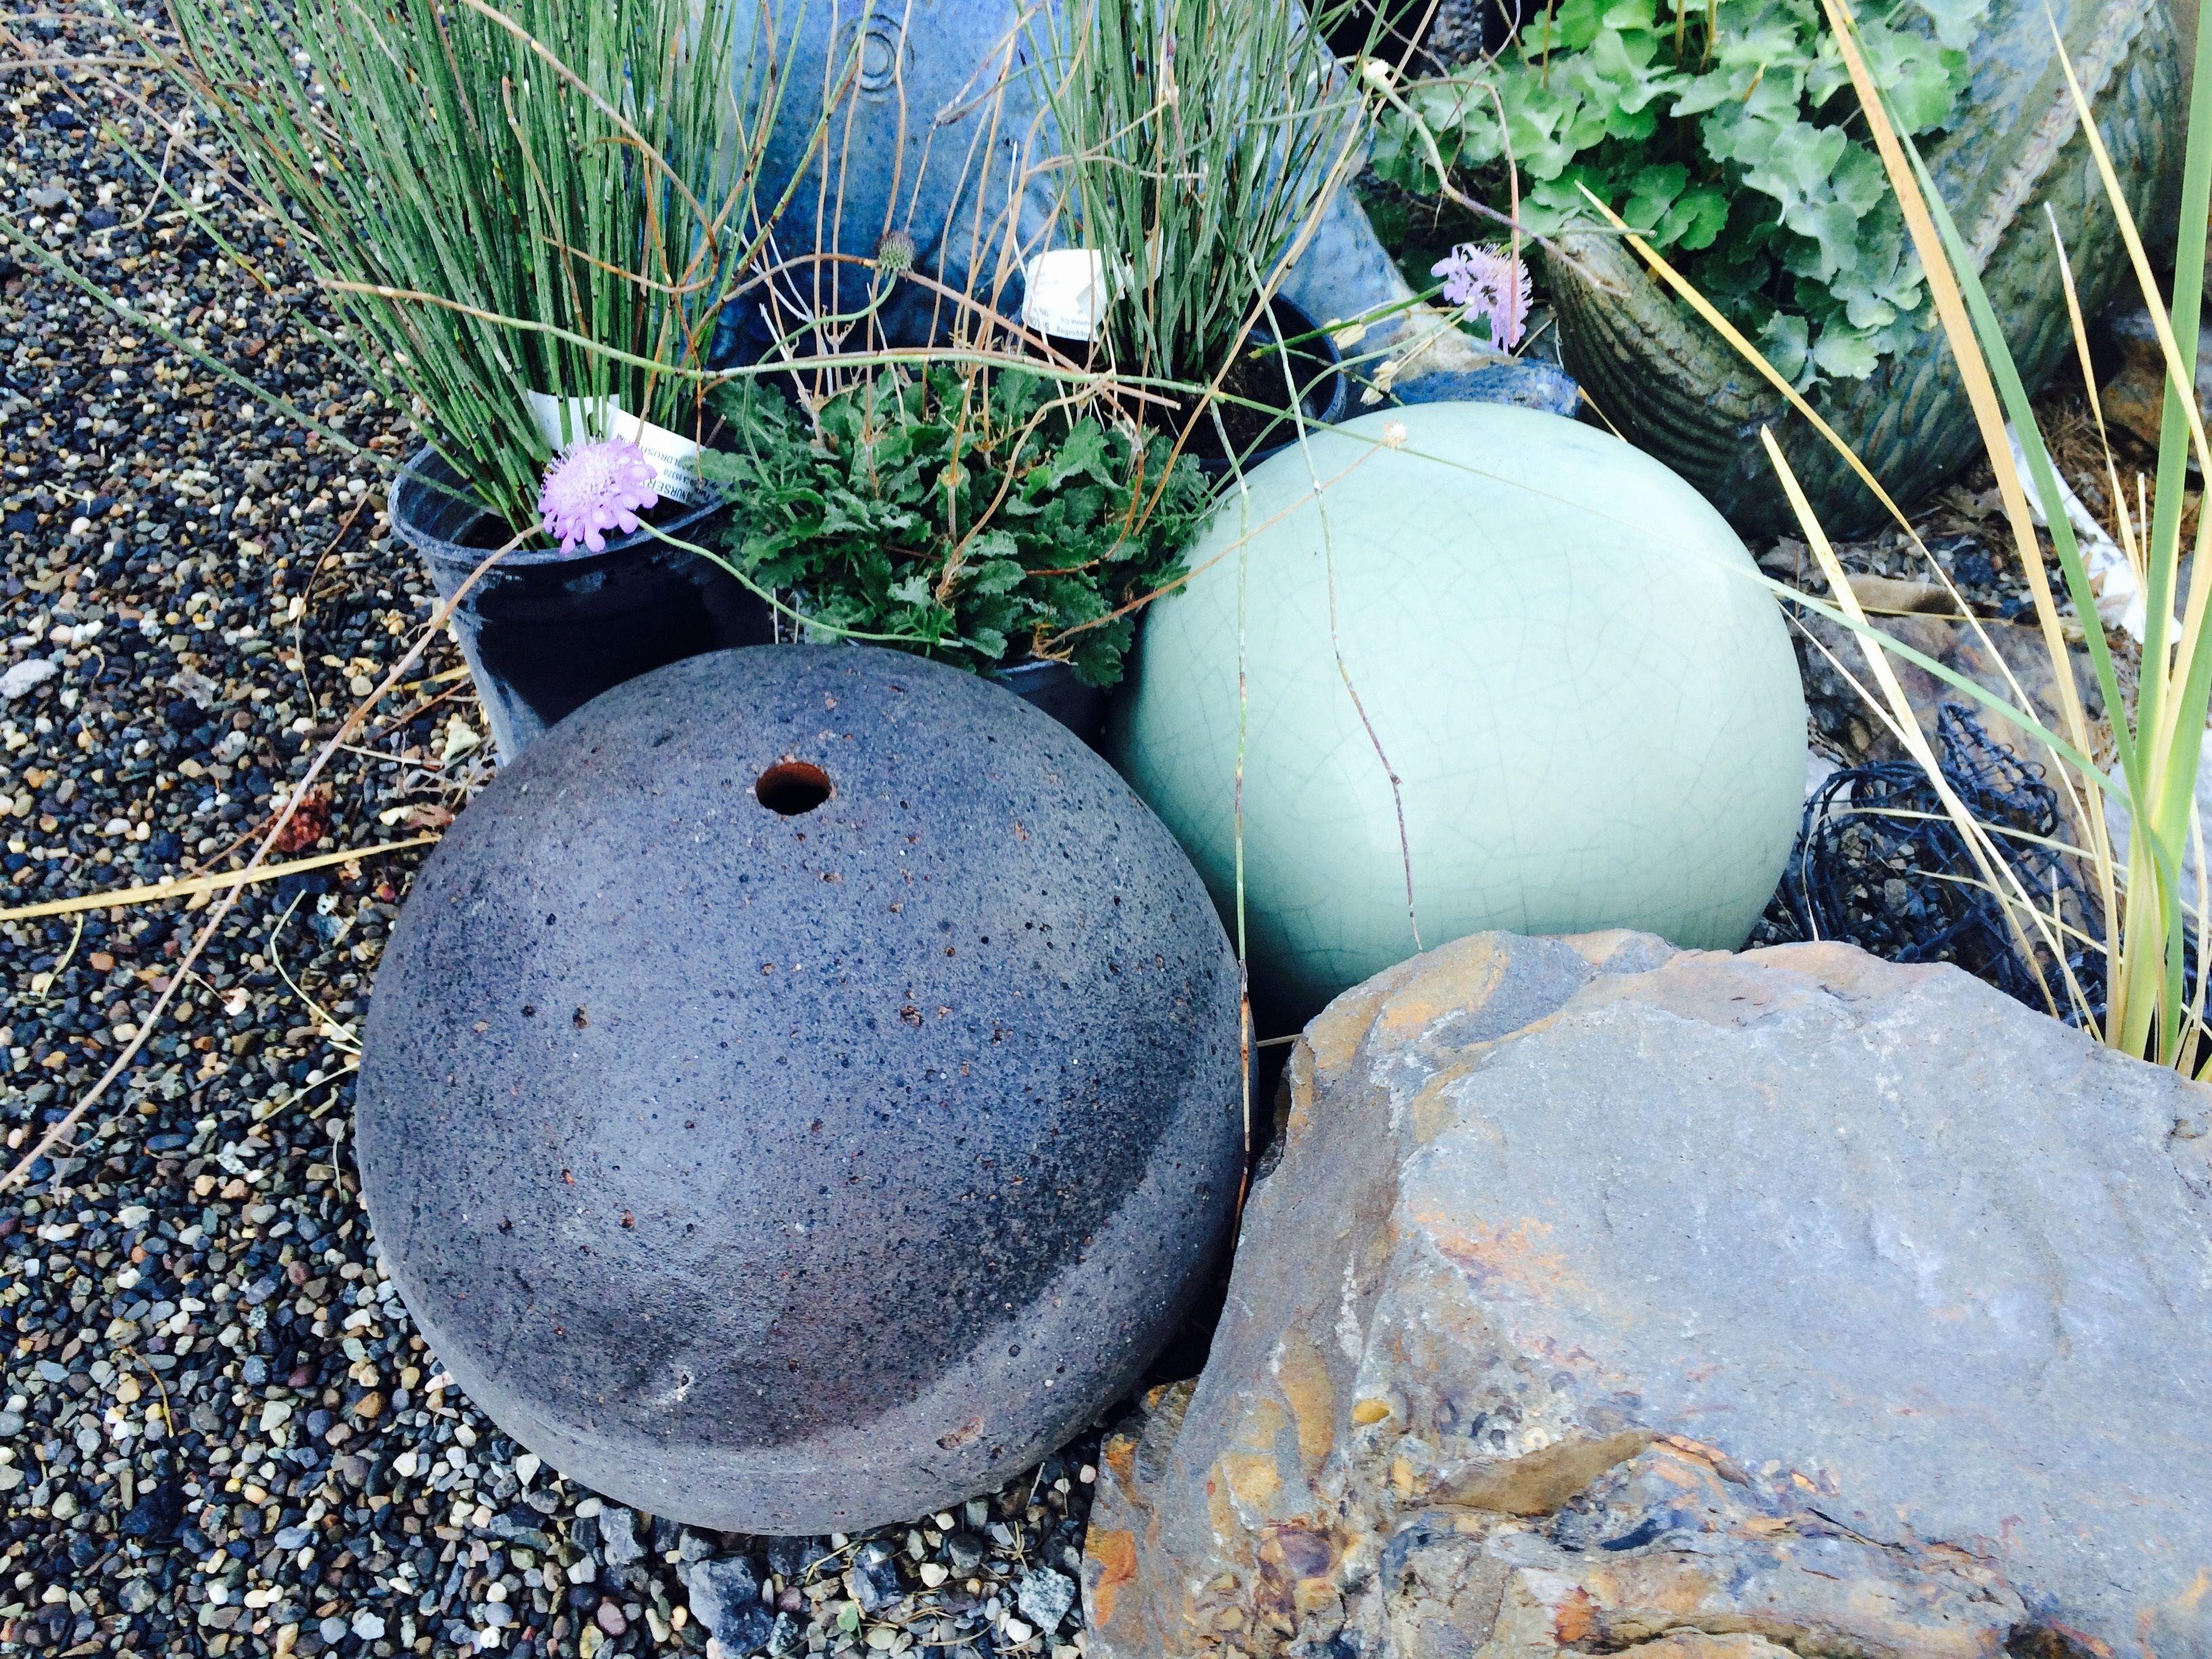 Bon Decorative Spheres, Available At Solomonu0027s Gardens Nursery